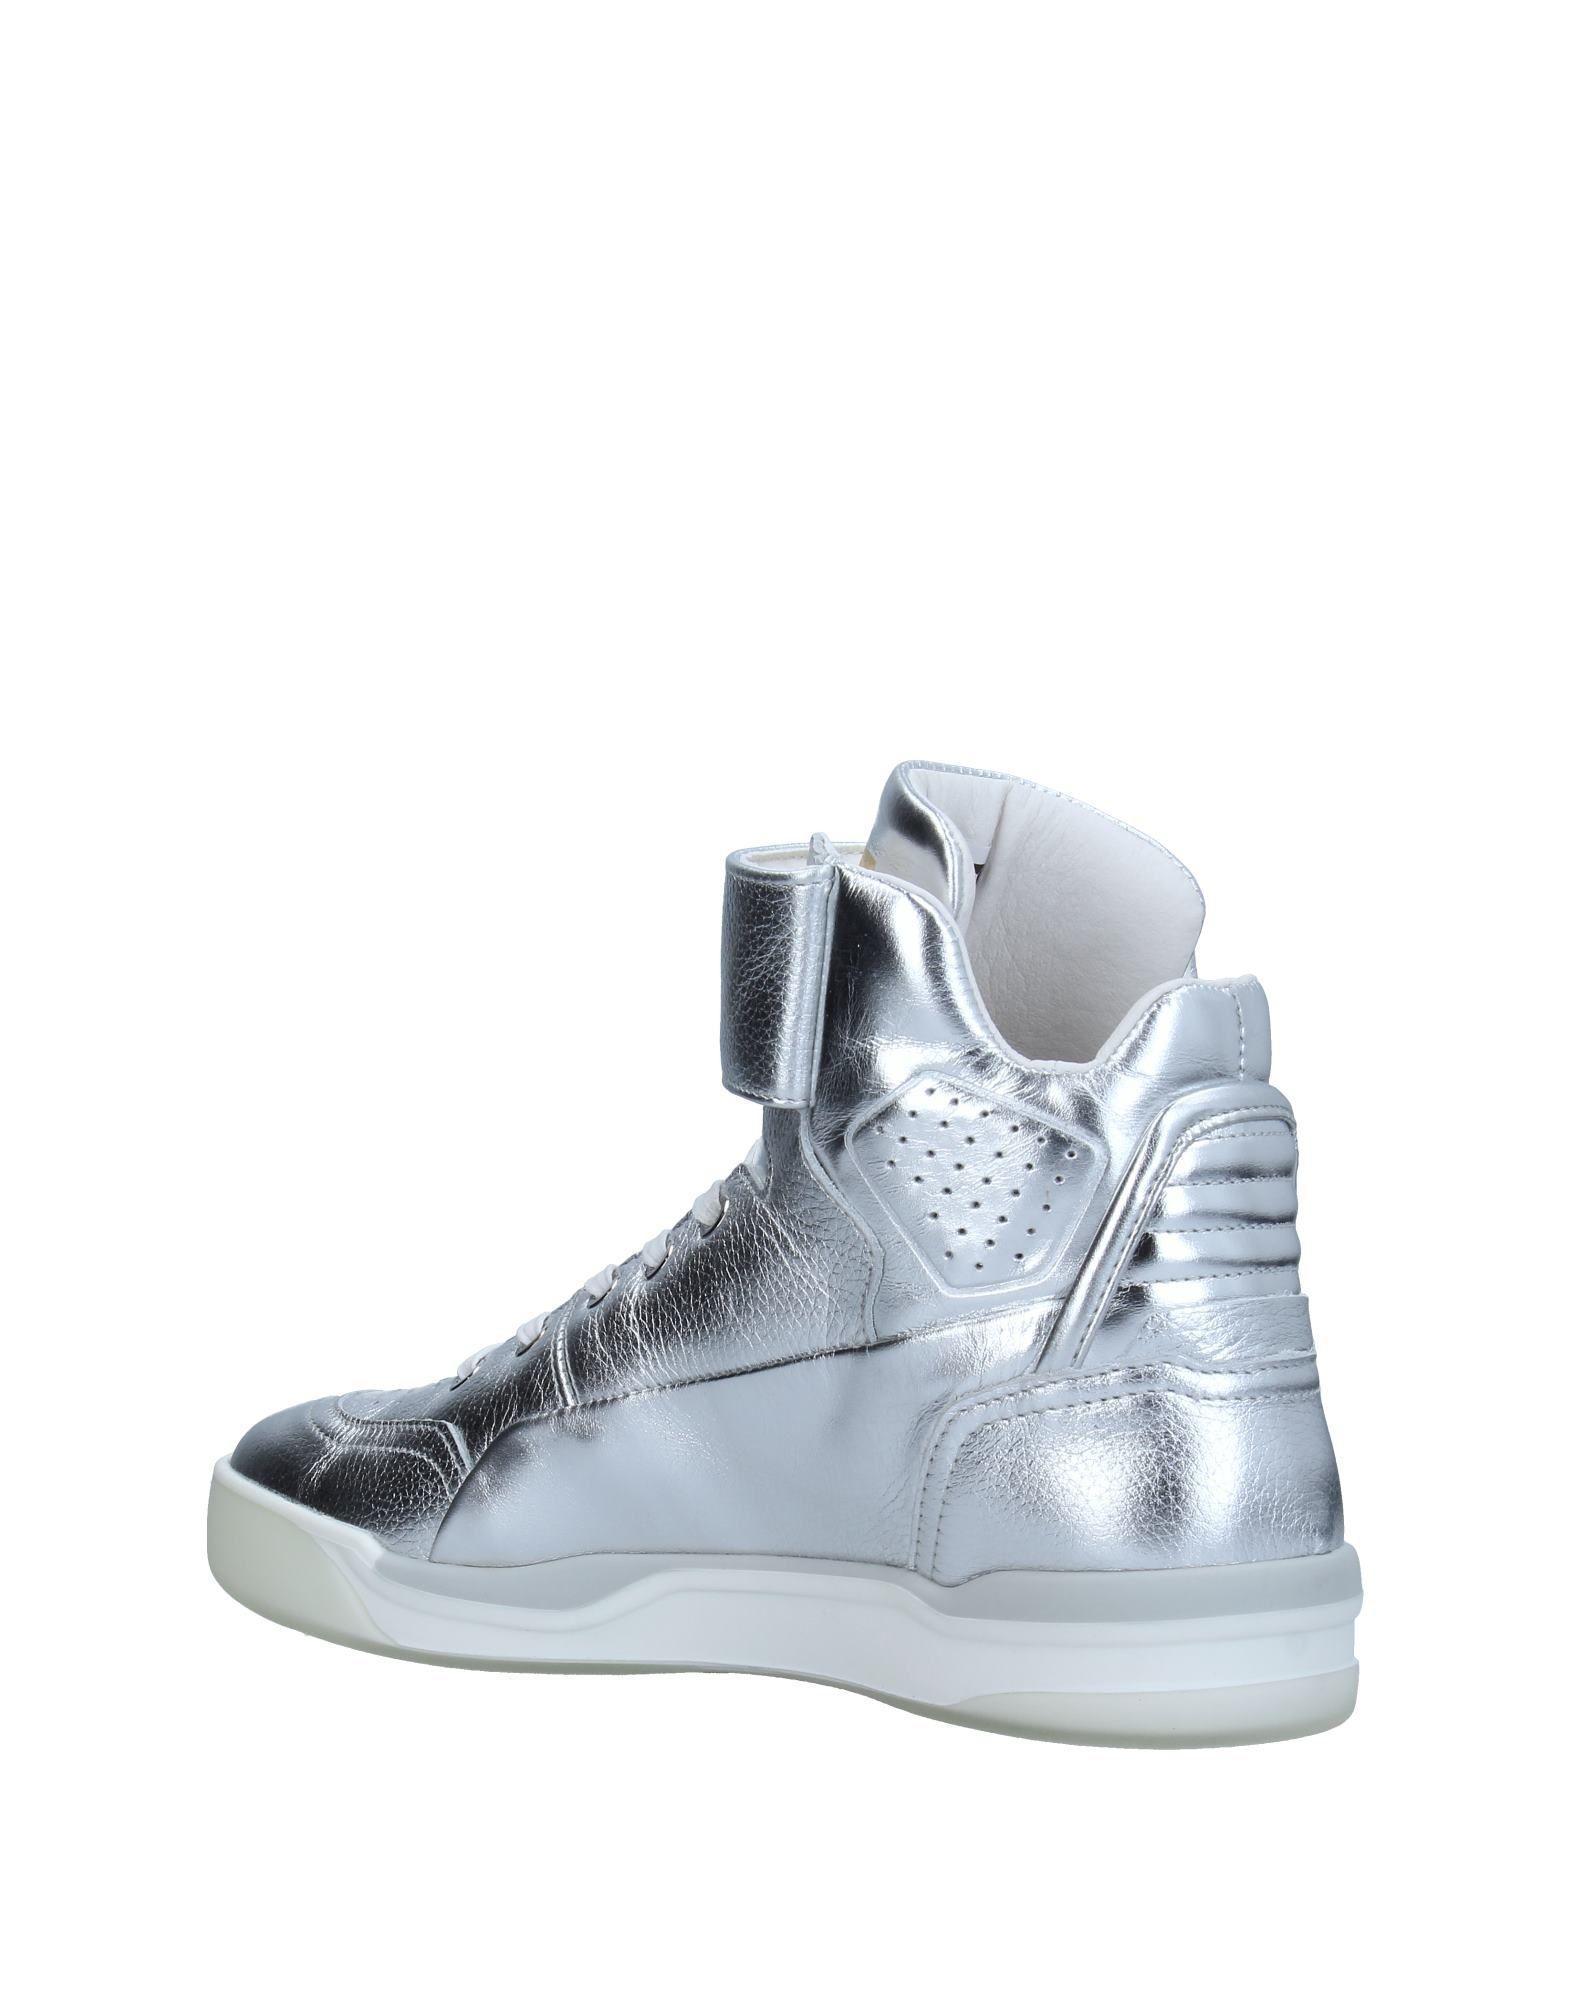 ffc3fb1ed71 Alexander McQueen X Puma - Metallic High-tops   Sneakers - Lyst. View  fullscreen